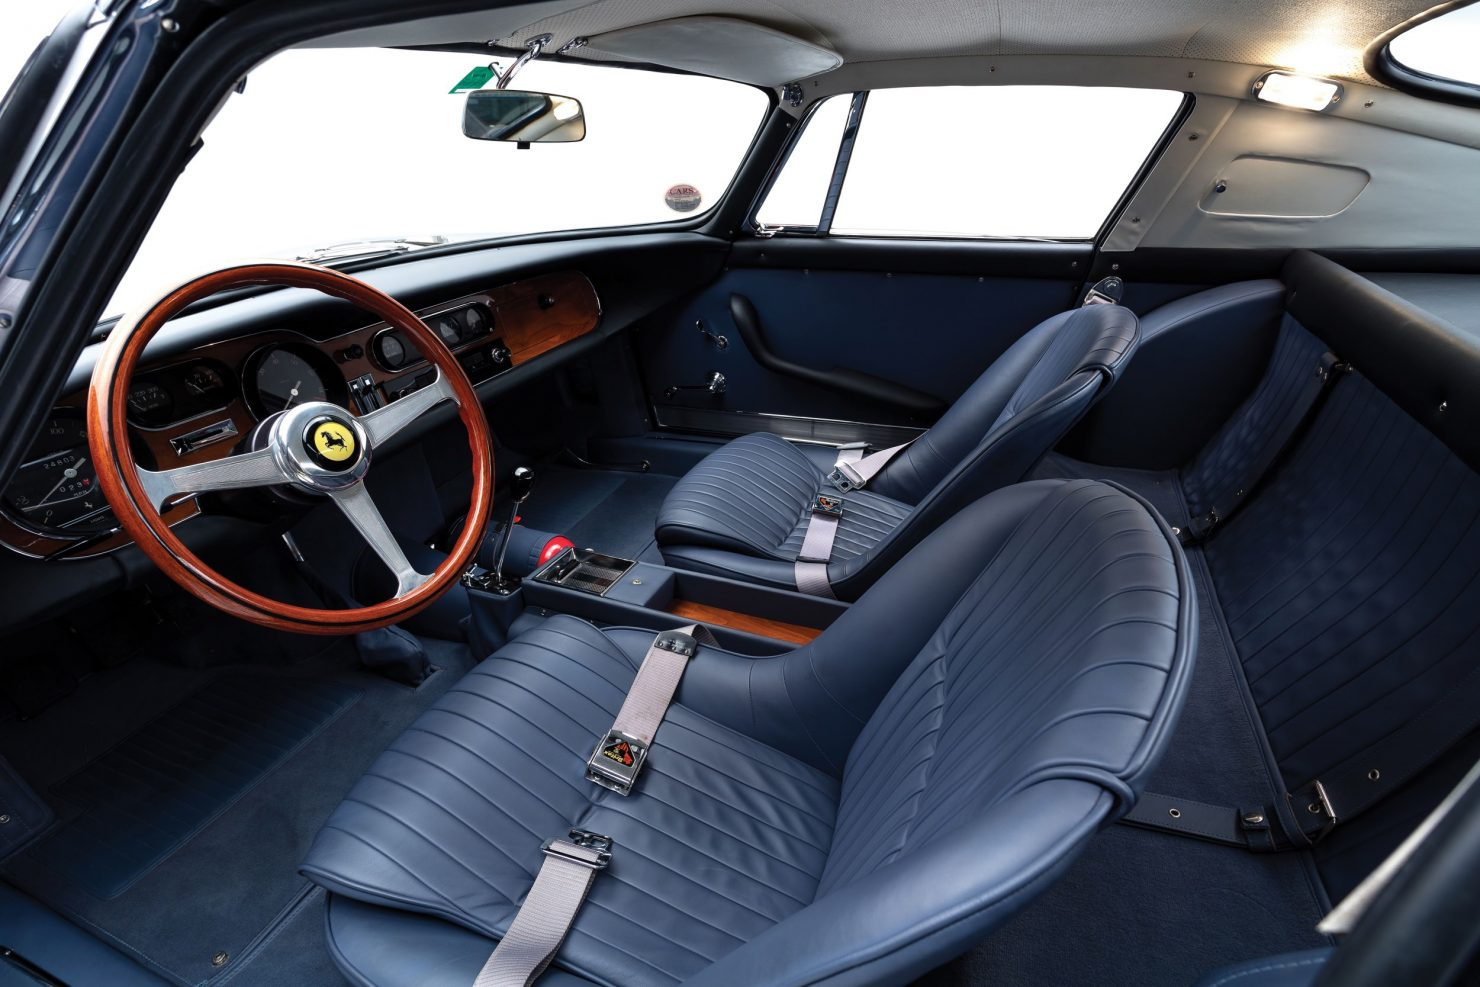 ferrari 275 gtb car 4 1480x987 - 1965 Ferrari 275 GTB/6C Alloy